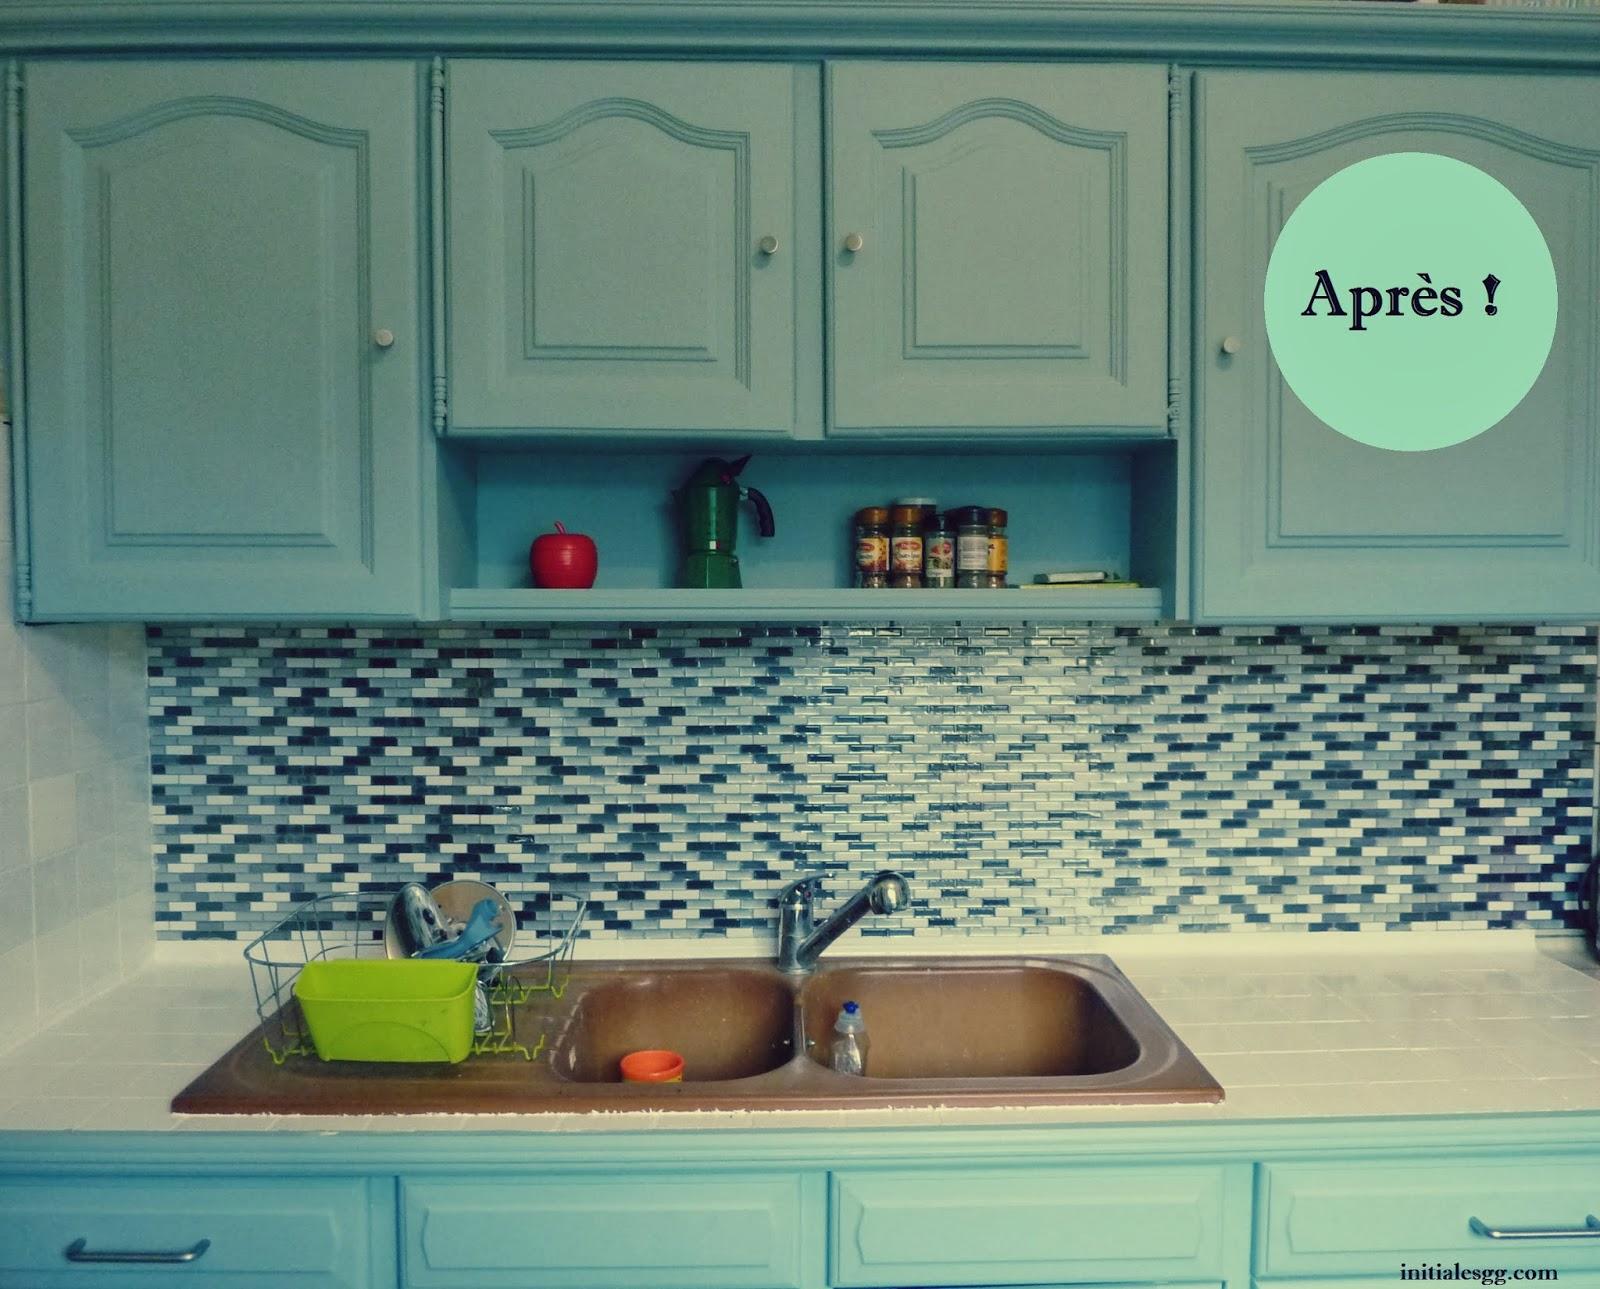 avant apr s r nover sa cuisine en 2 week end initiales gg. Black Bedroom Furniture Sets. Home Design Ideas